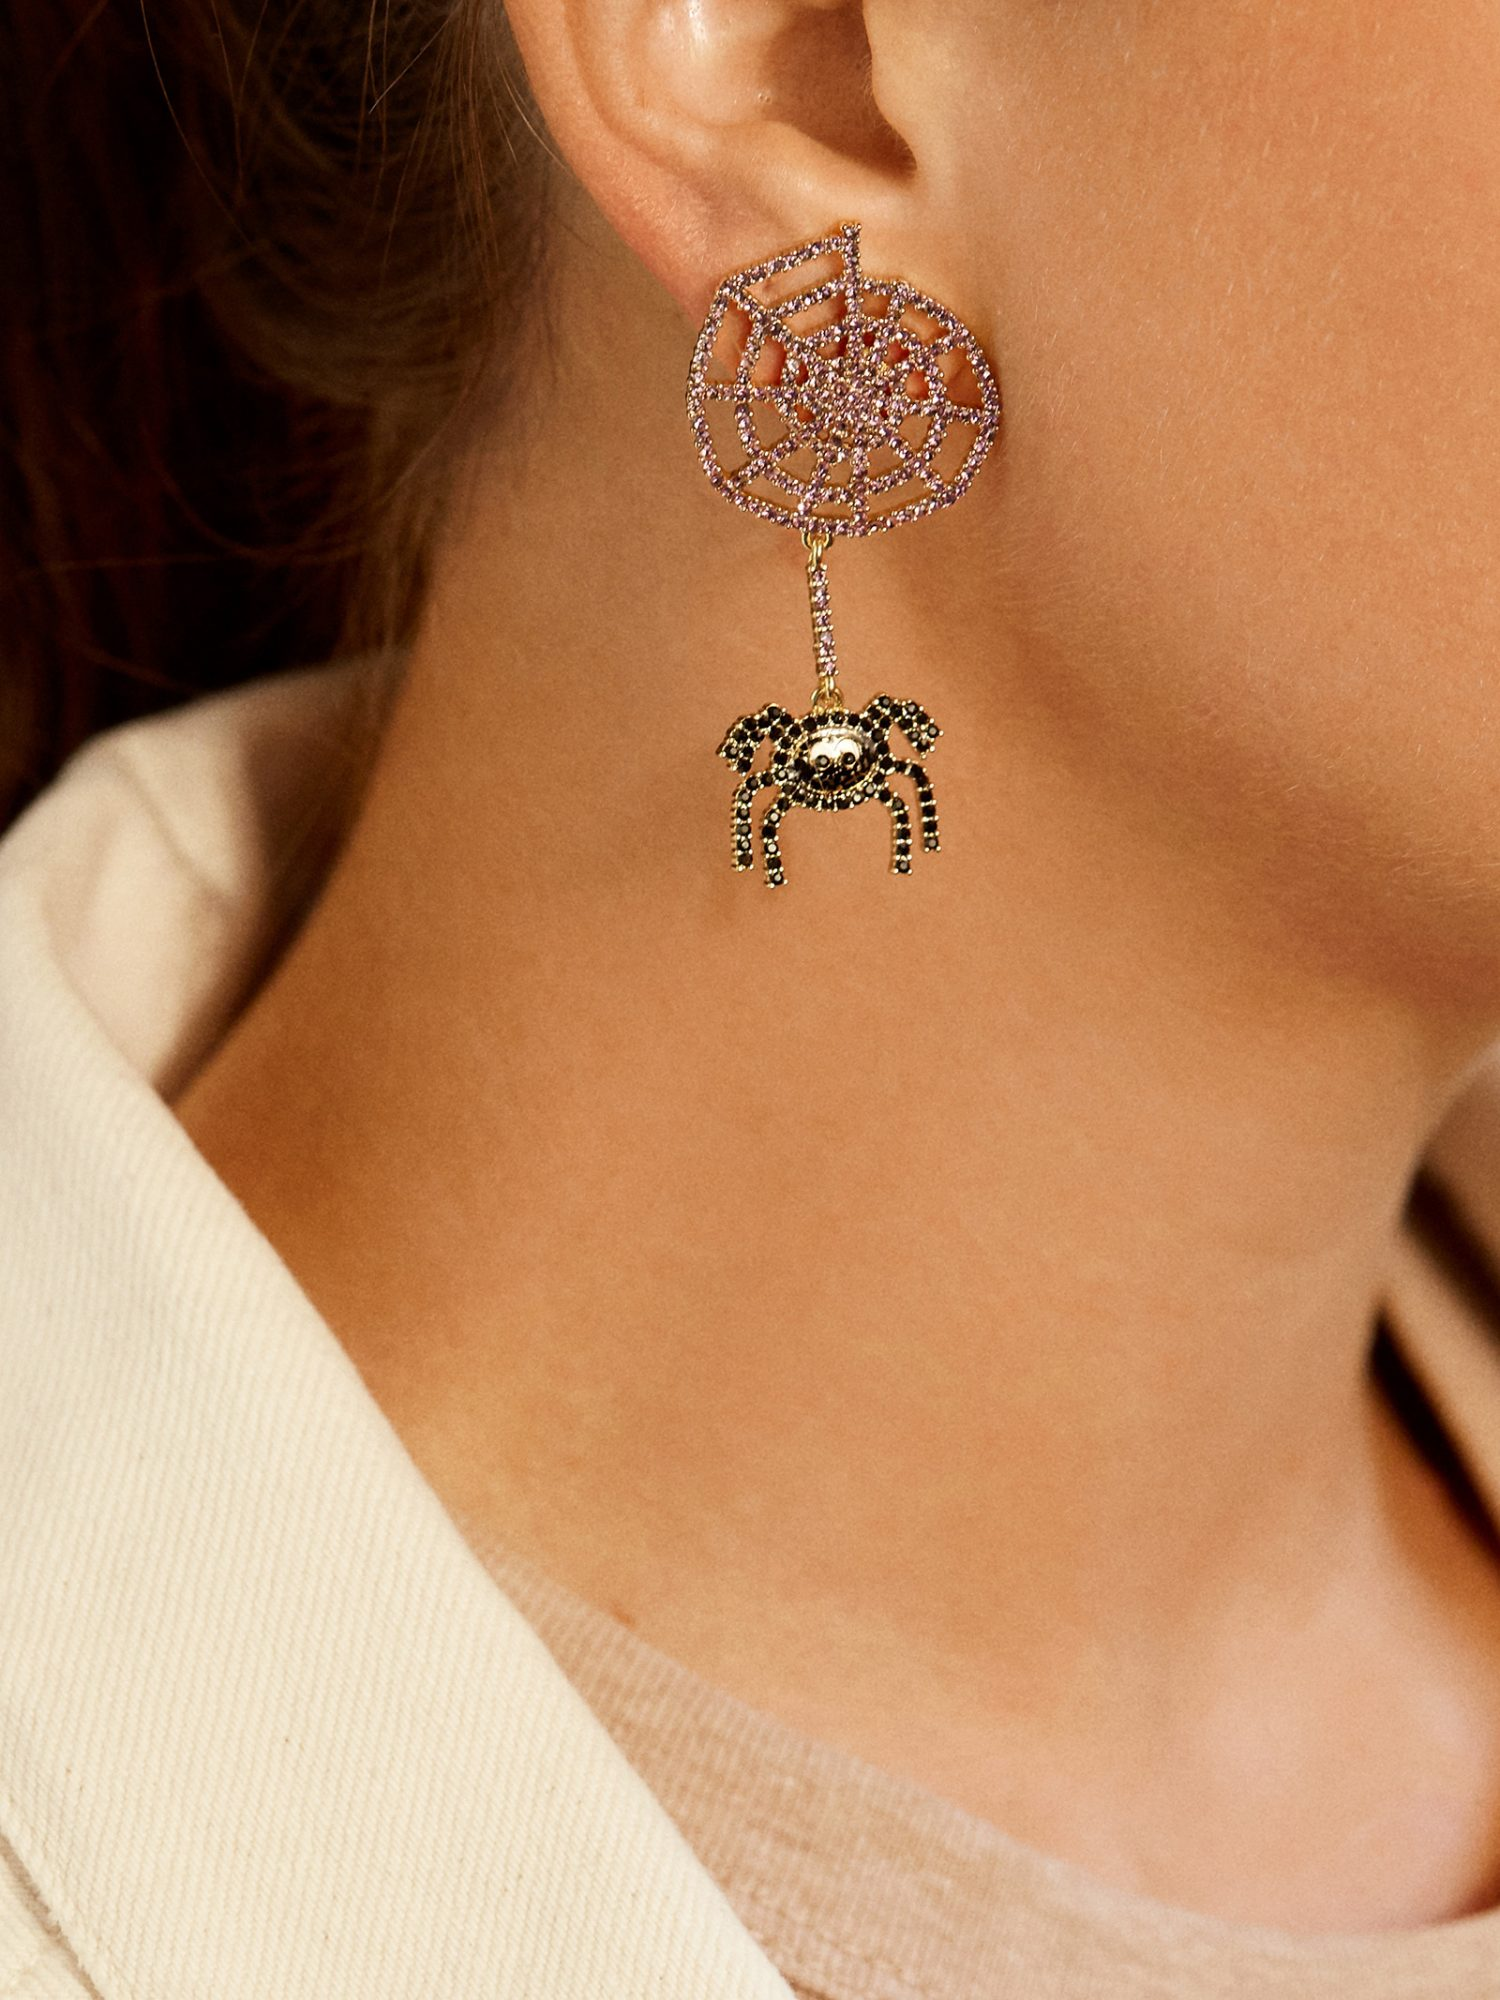 baublebar halloween spider earrings